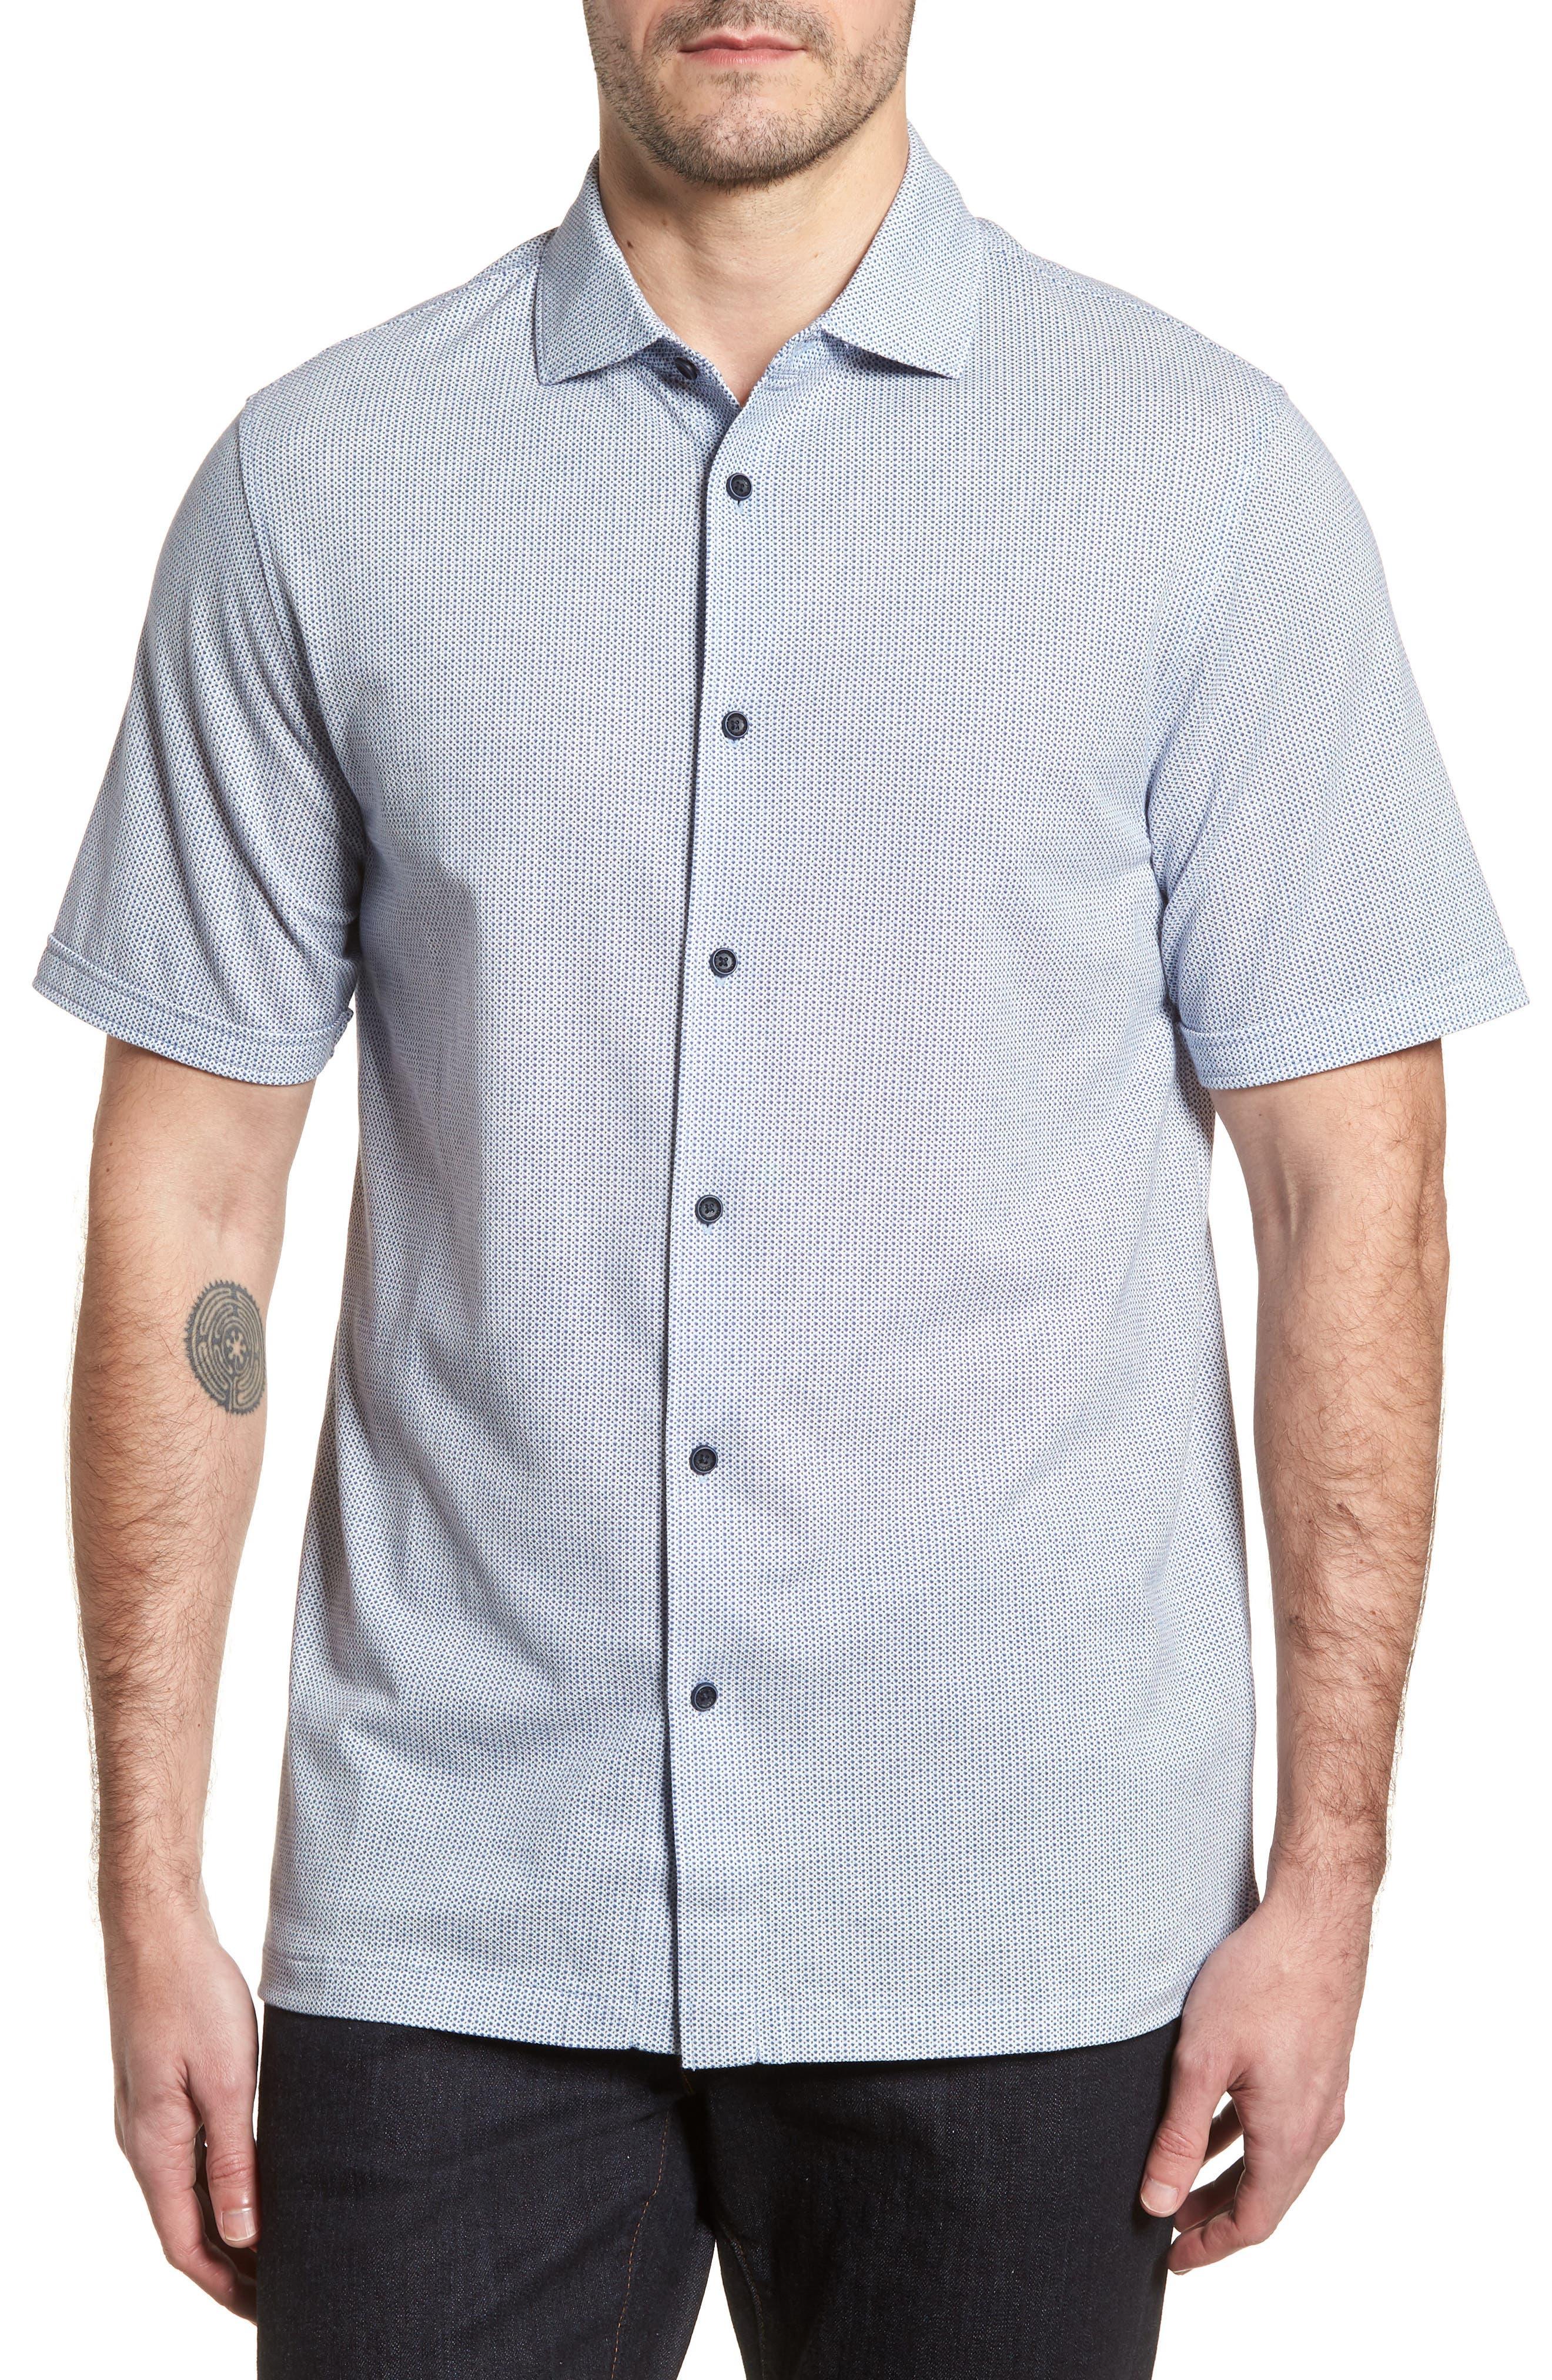 BUGATCHI Shaped Fit Microprint Sport Shirt, Main, color, CLASSIC BLUE